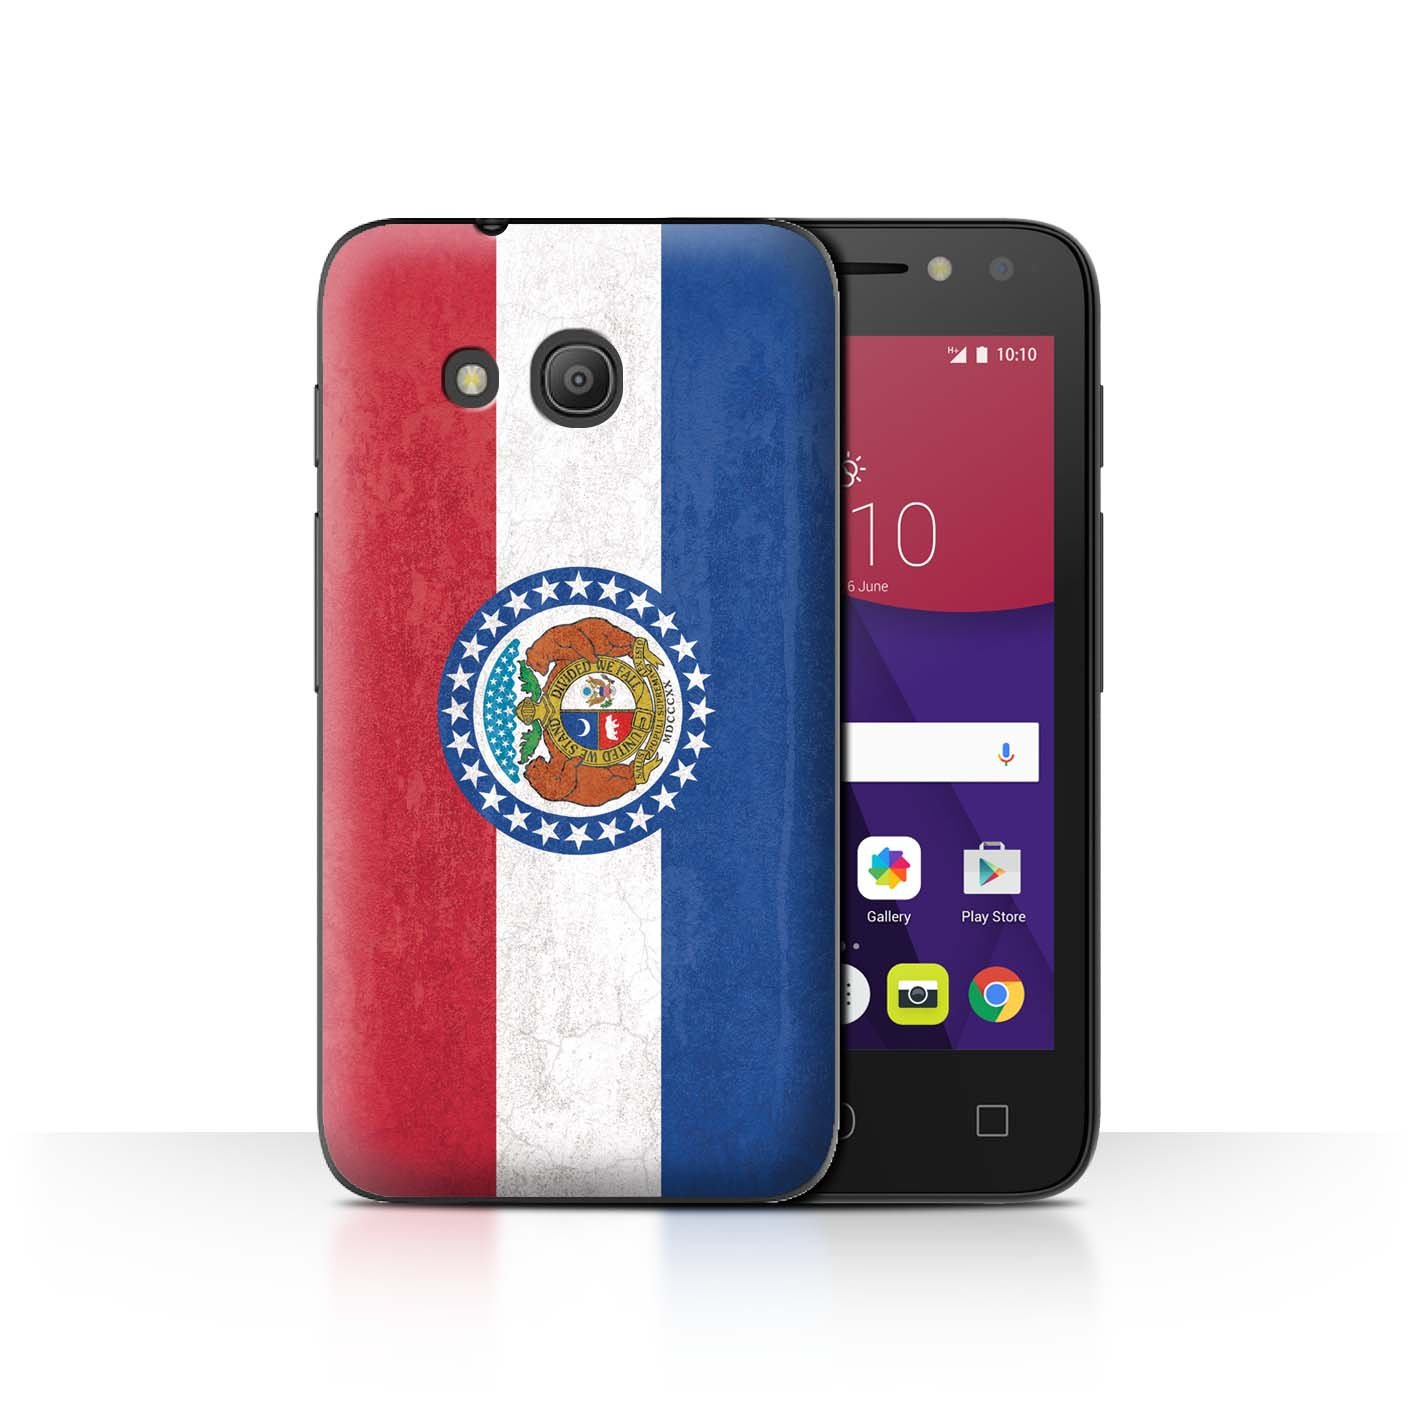 outlet store 47a45 7641d Roseglennorthdakota / Try These Pixi 4 Phone Cases